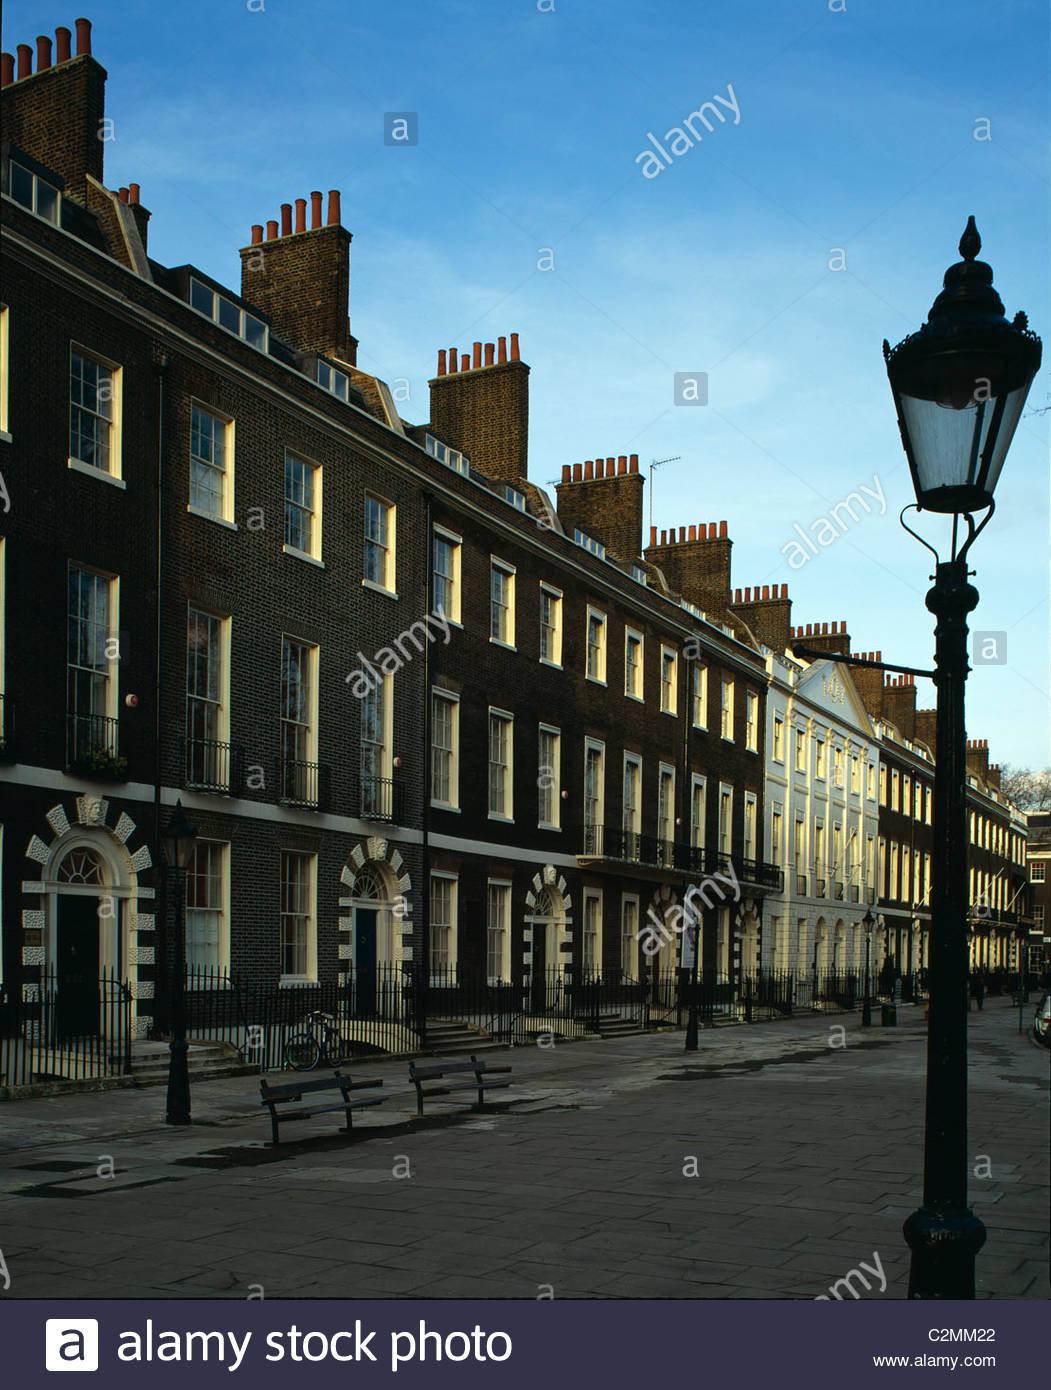 Bedford Square, Bloomsbury, London. 1775-1783 - Stock Image